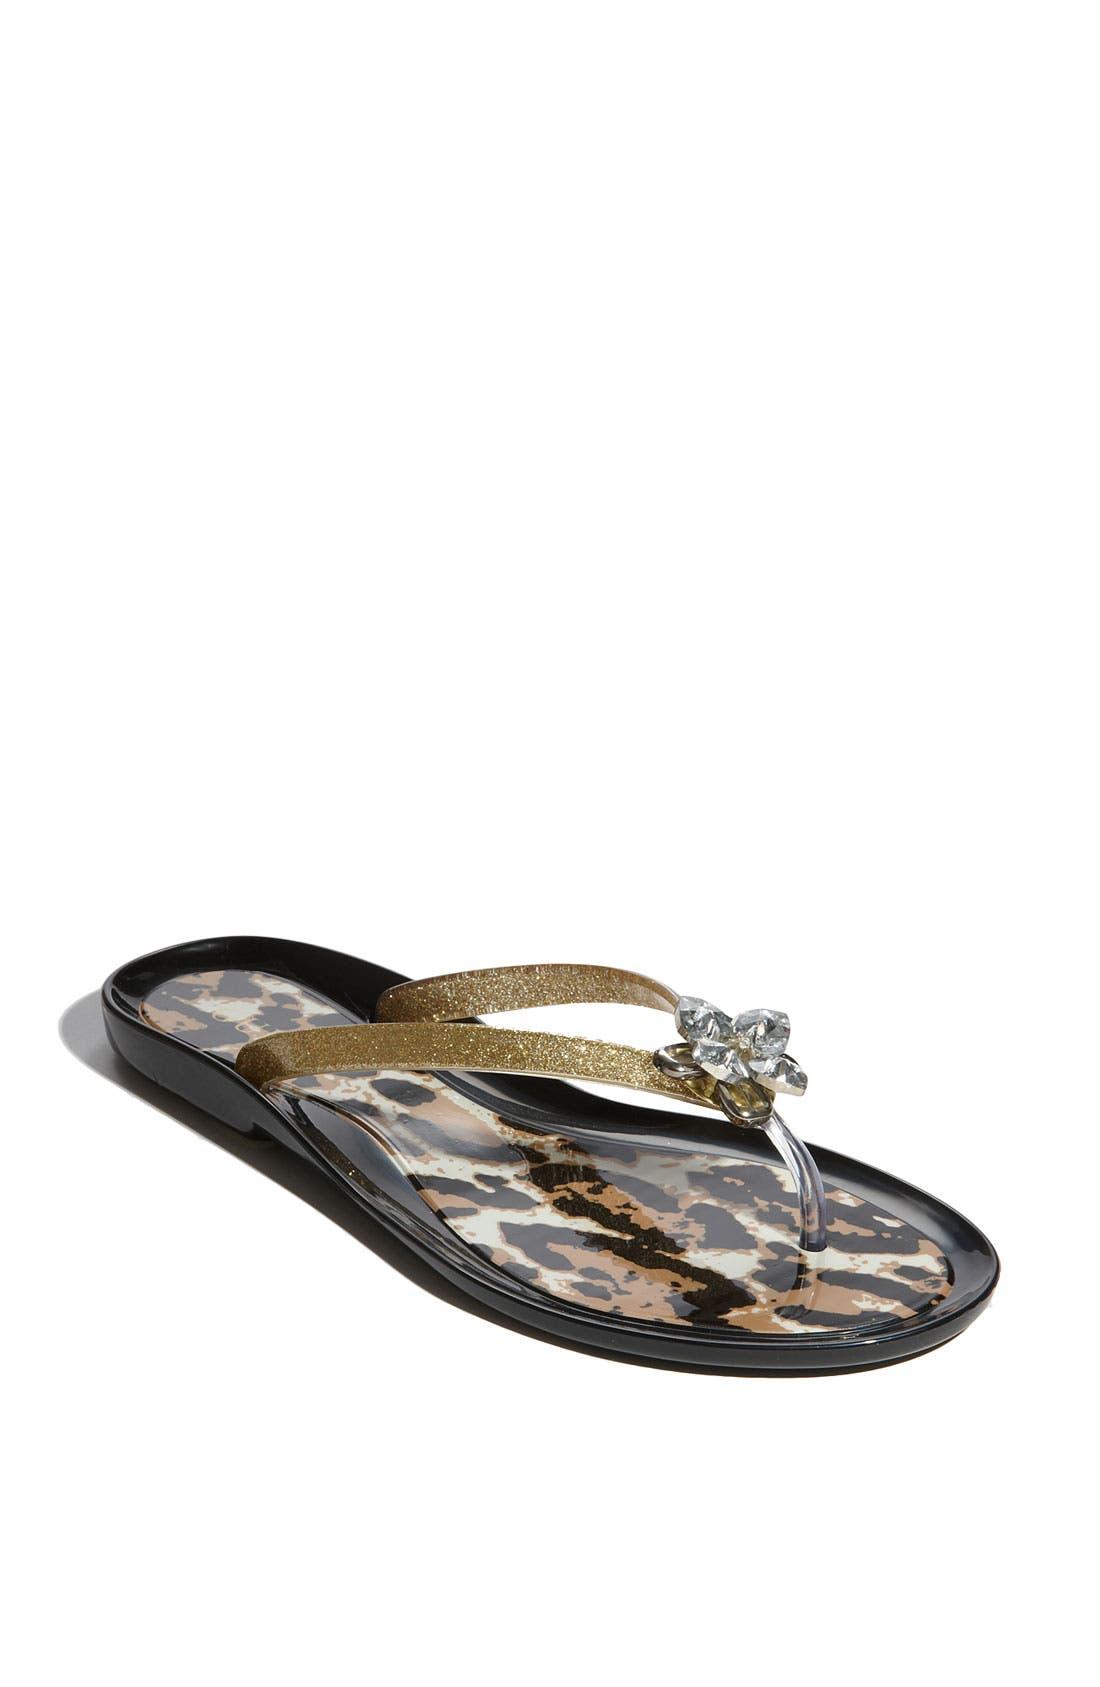 Alternate Image 1 Selected - GUESS 'Neno' Sandal